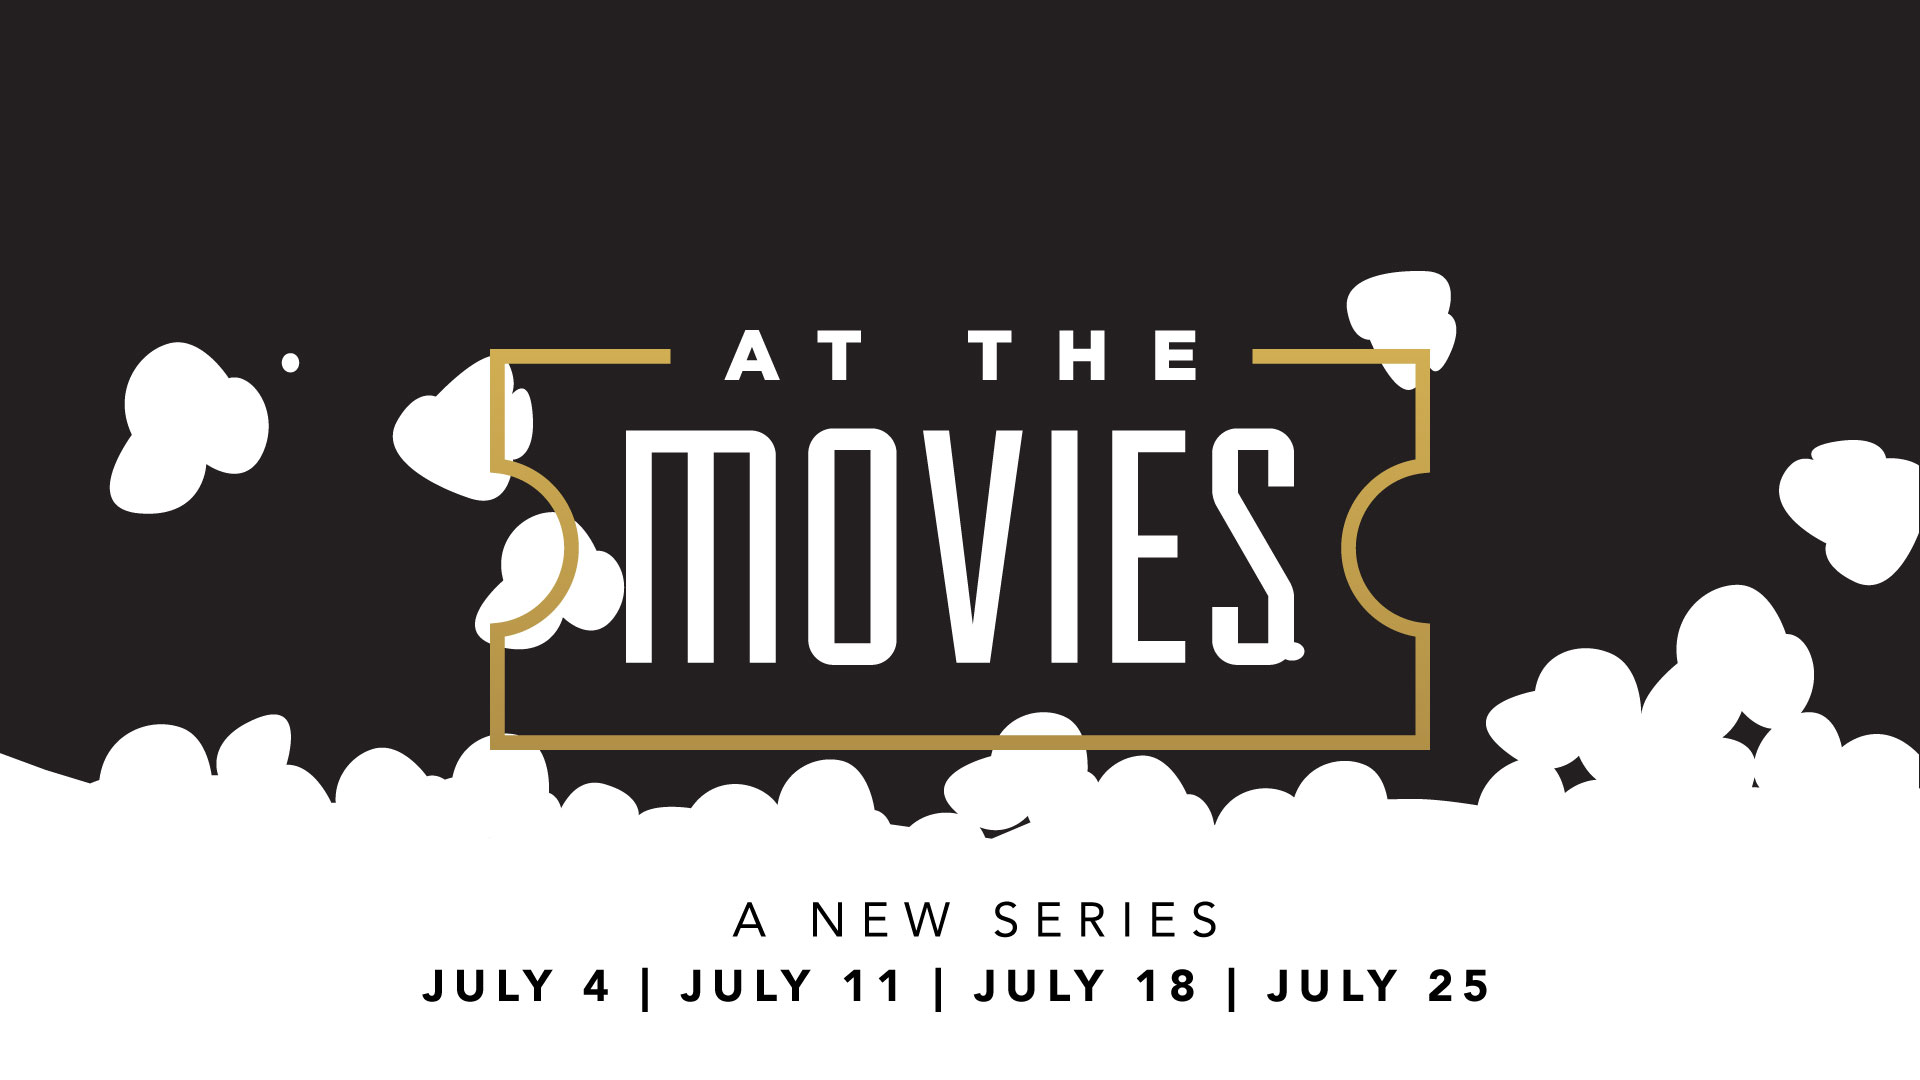 At-The-Movies_screens